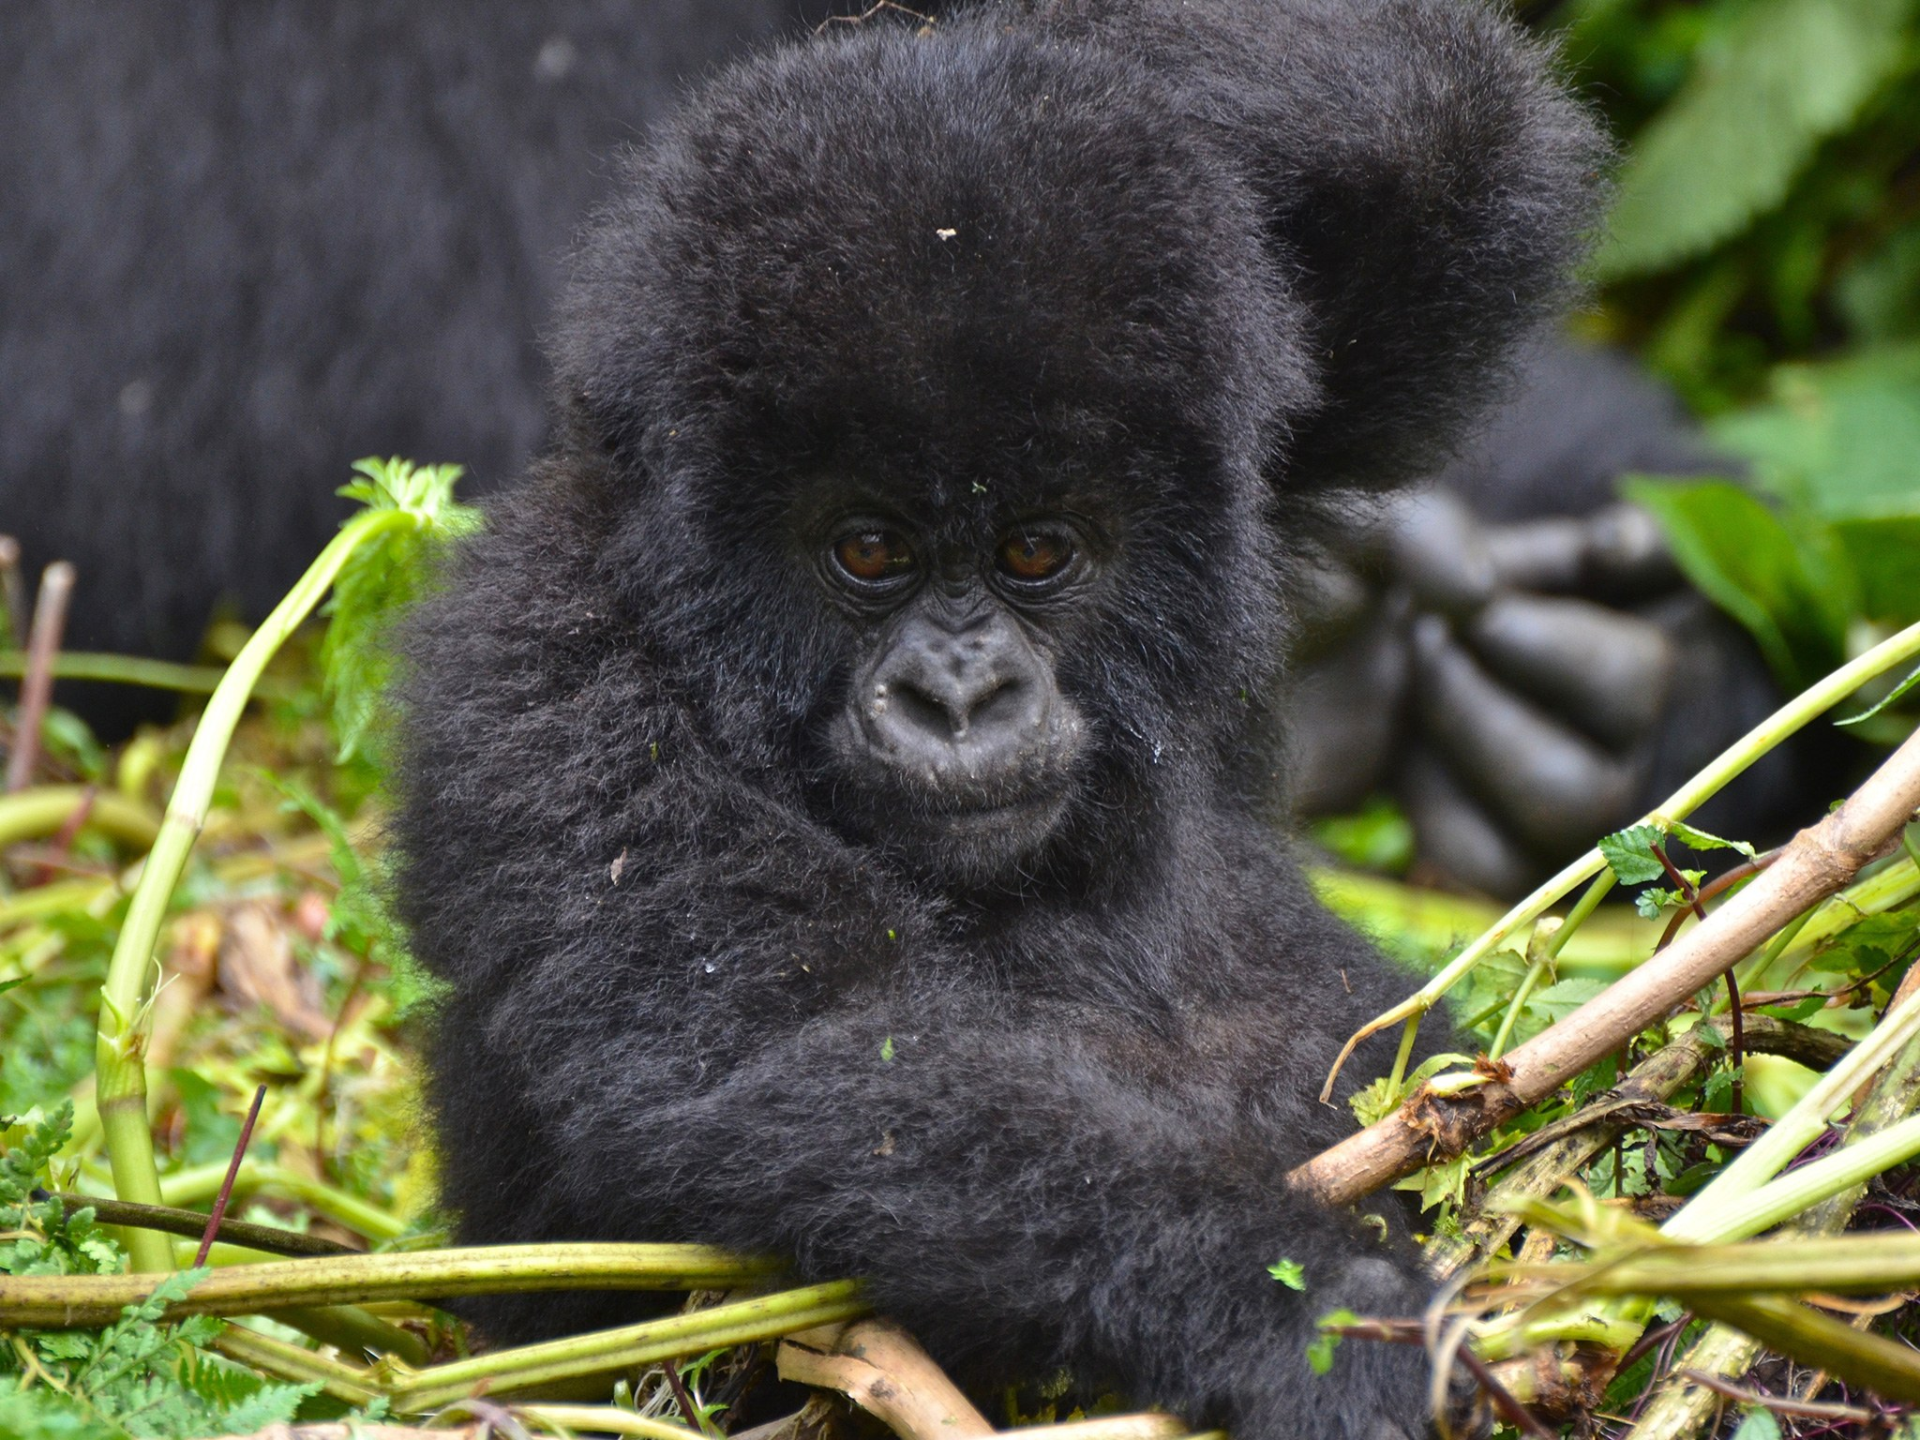 2. Горные гориллы – Руанда.